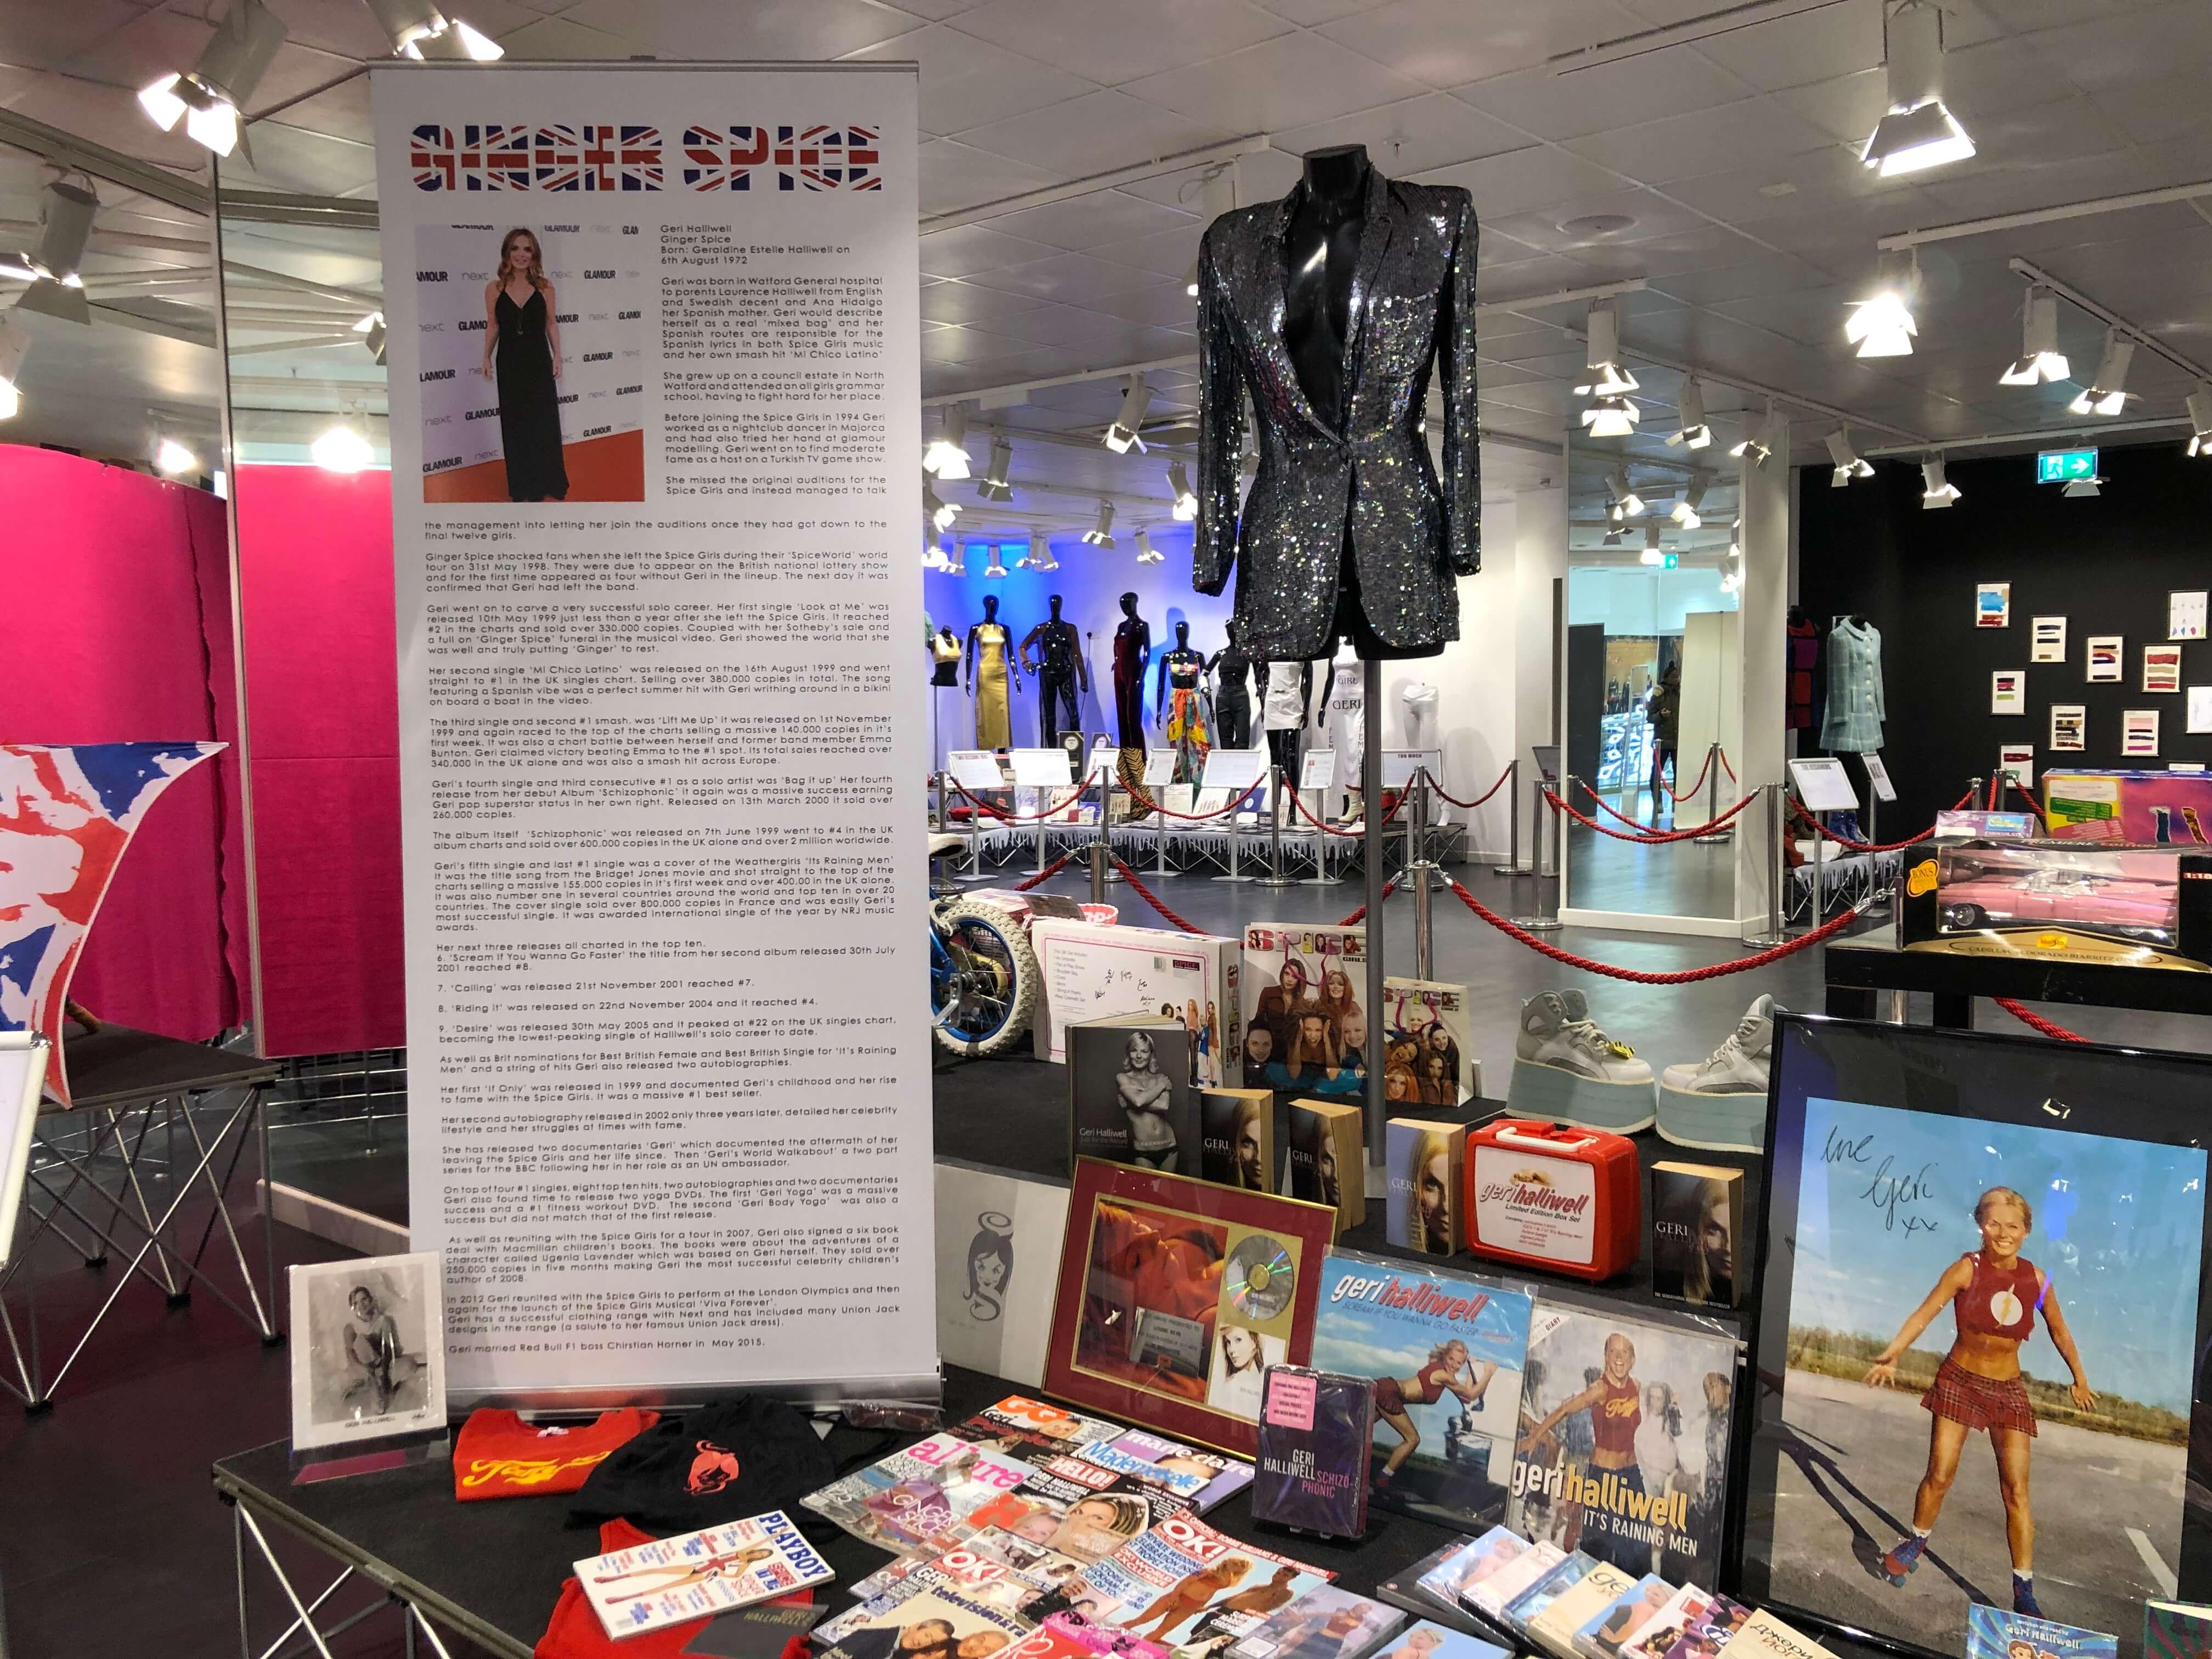 Ginger Spice - Spice Girls Exhibition